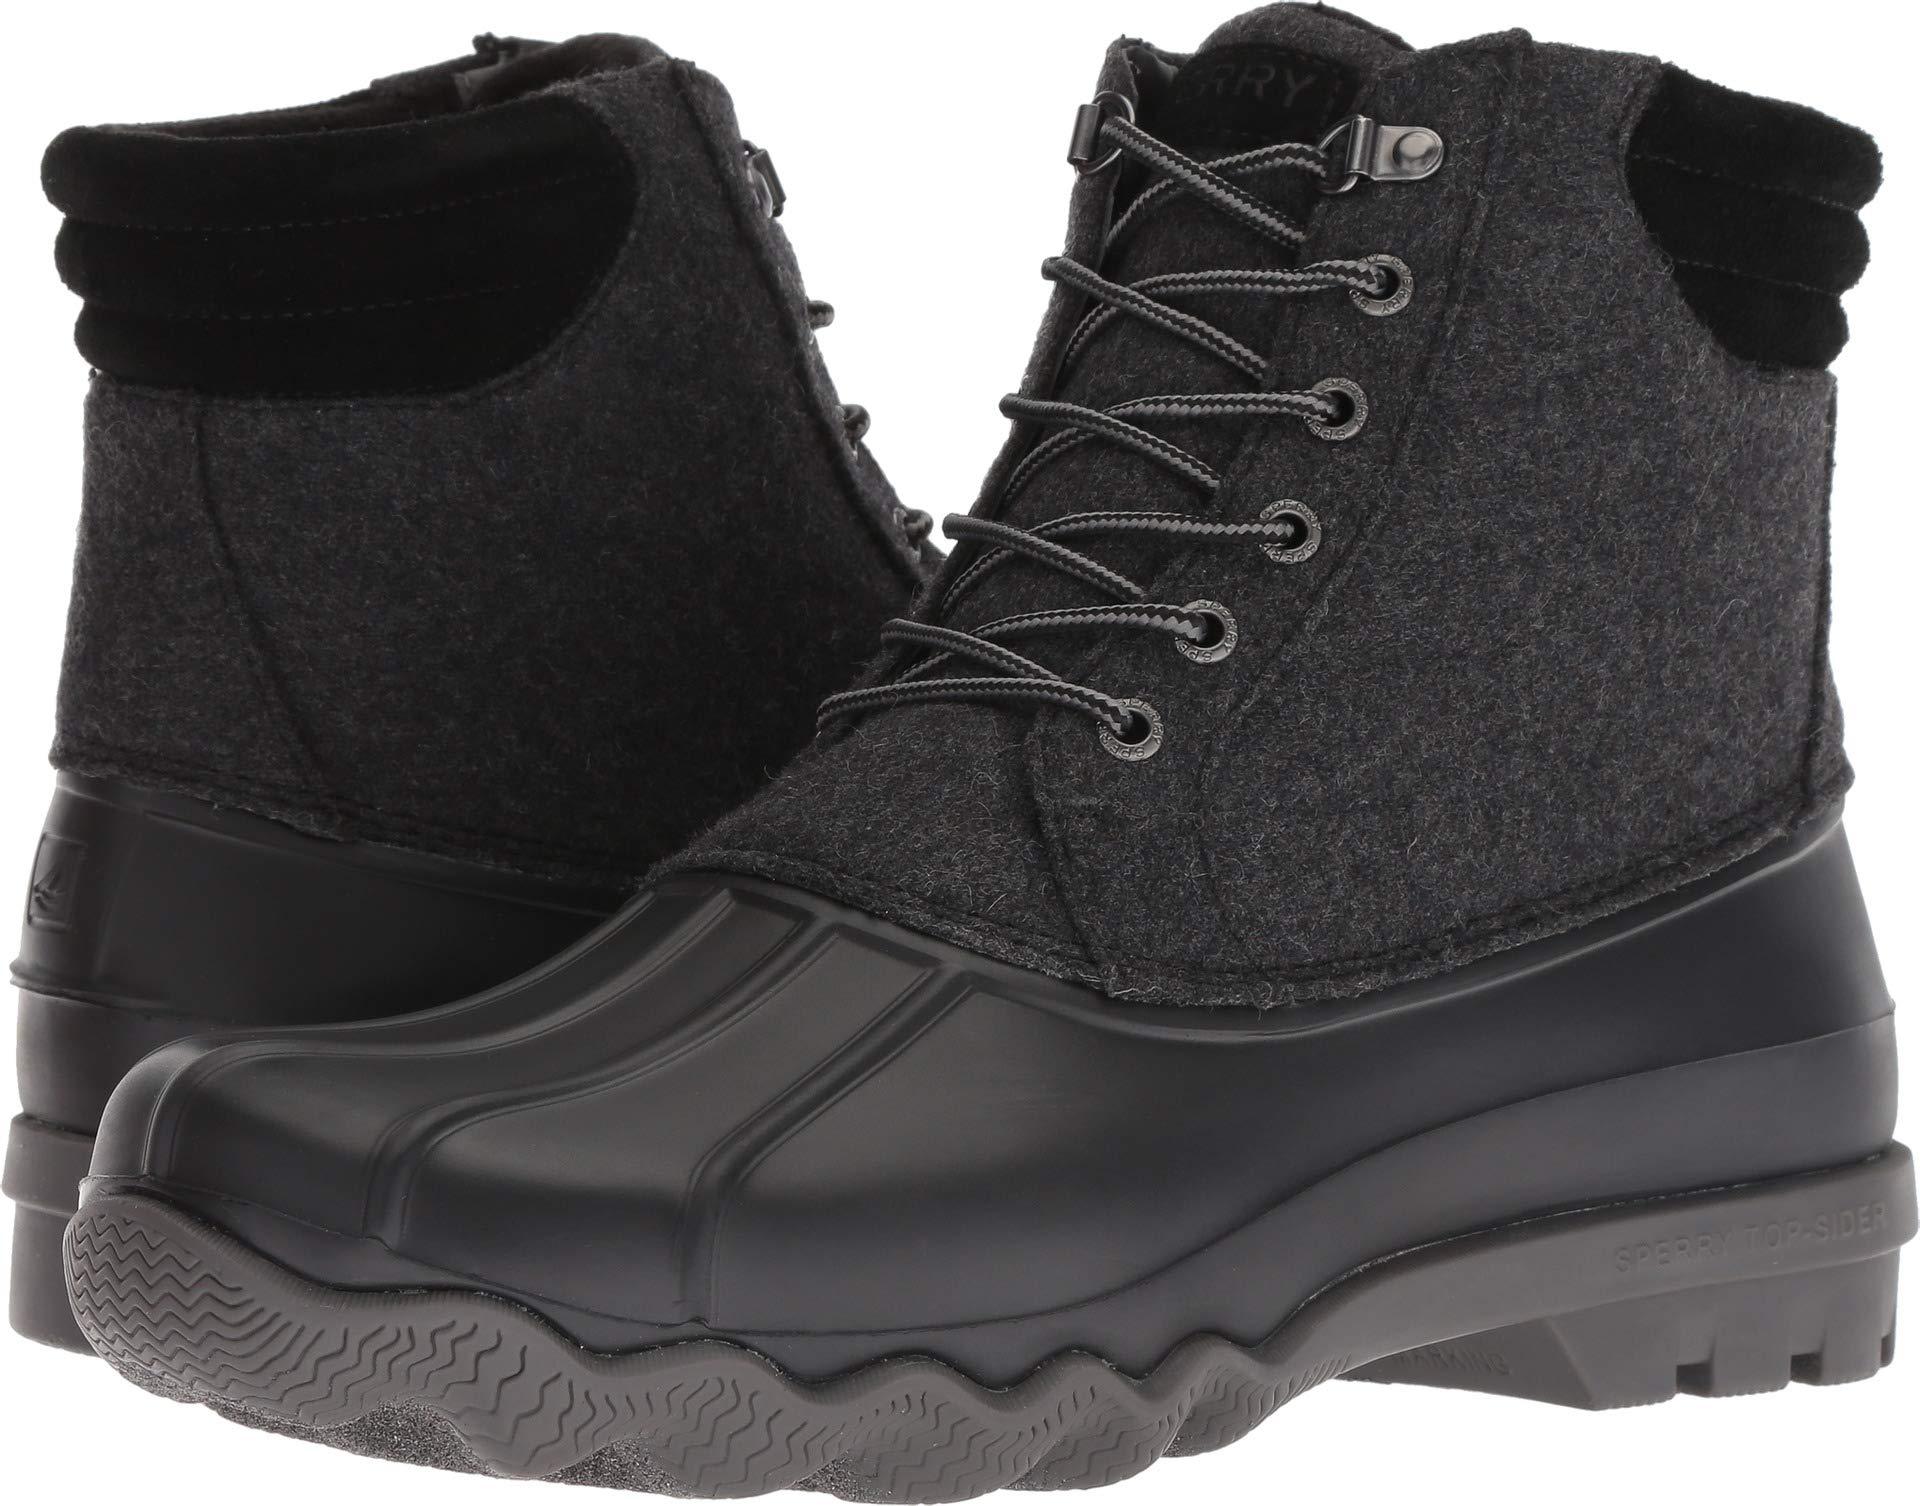 SPERRY Men's Avenue Duck Wool Rain Boot, Grey, 8.5 M US